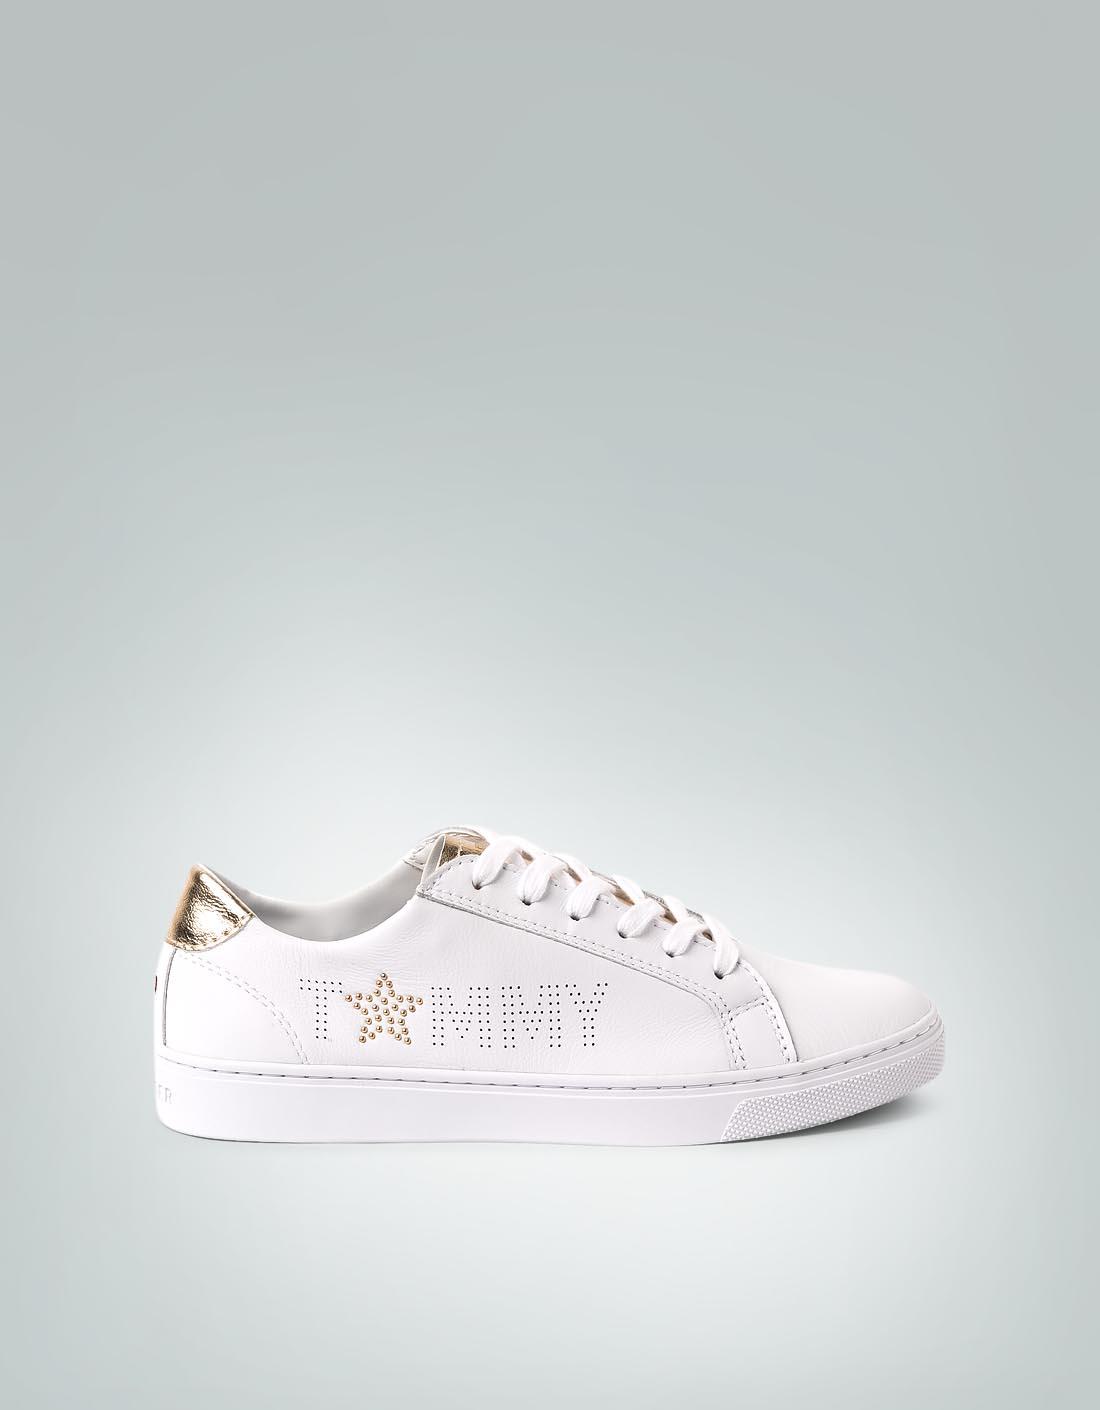 sports shoes 4412e 6e3c4 Tommy Hilfiger Damen Schuhe Sneaker mit Gold-Effekten ...